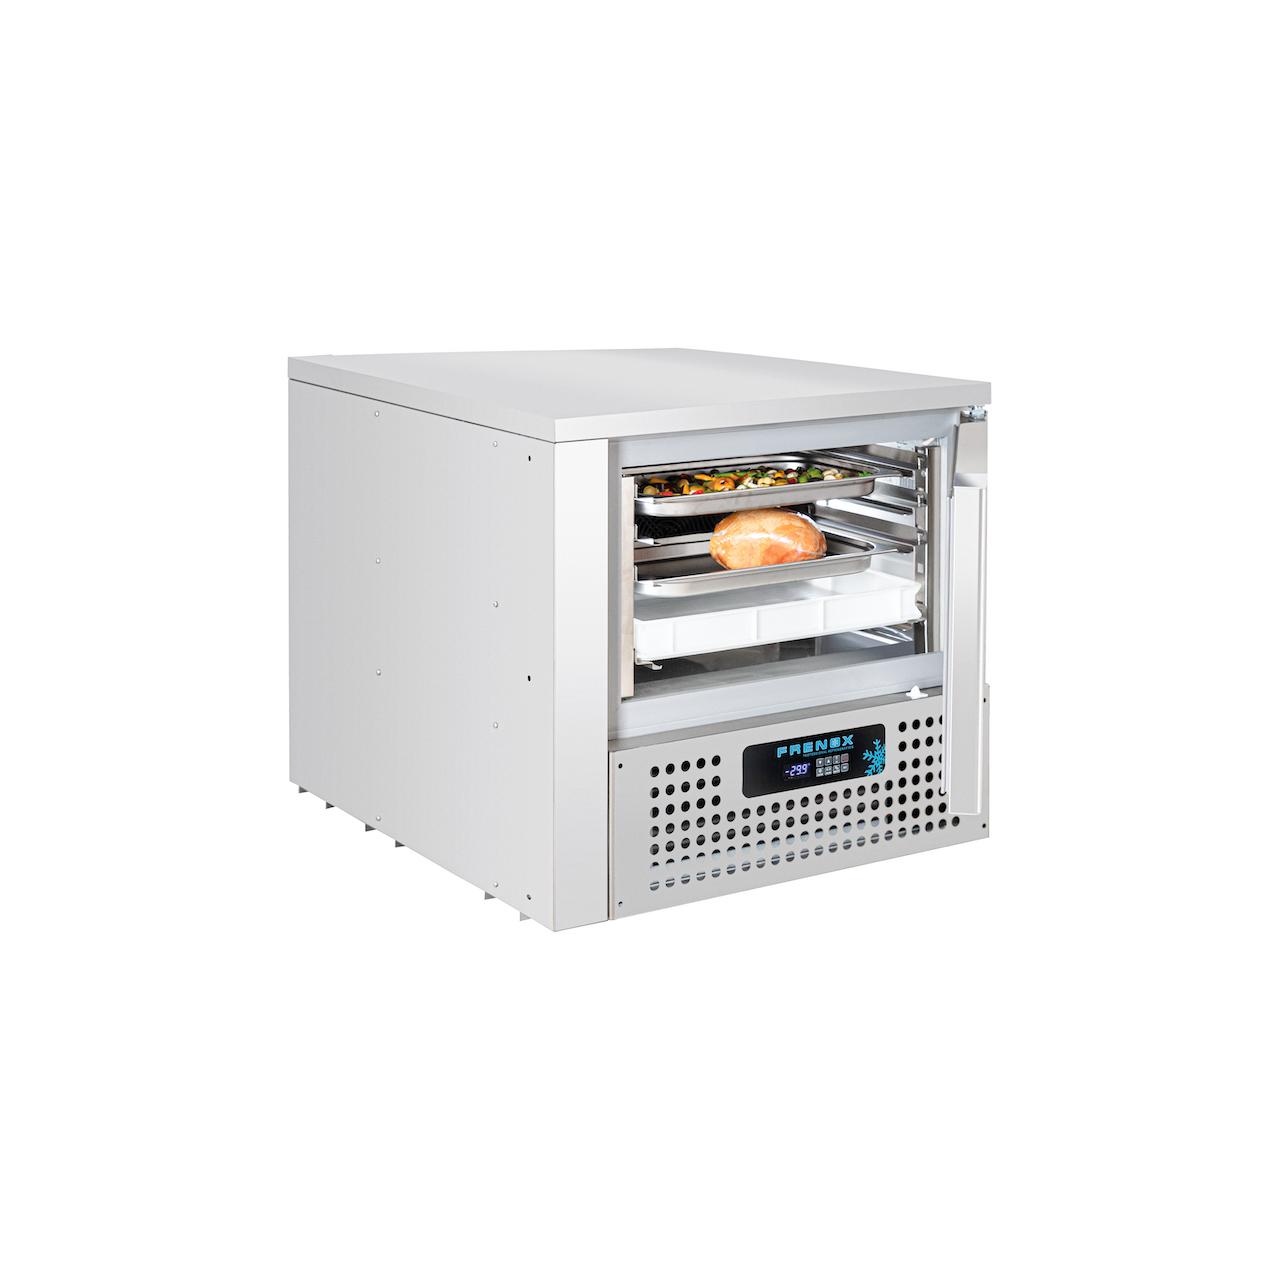 Frenox VBL5-F Premium Line Cihaz Altı Şok Soğutucu & Dondurucu 5 Tepsi(GN1/1 & 40 x 60)